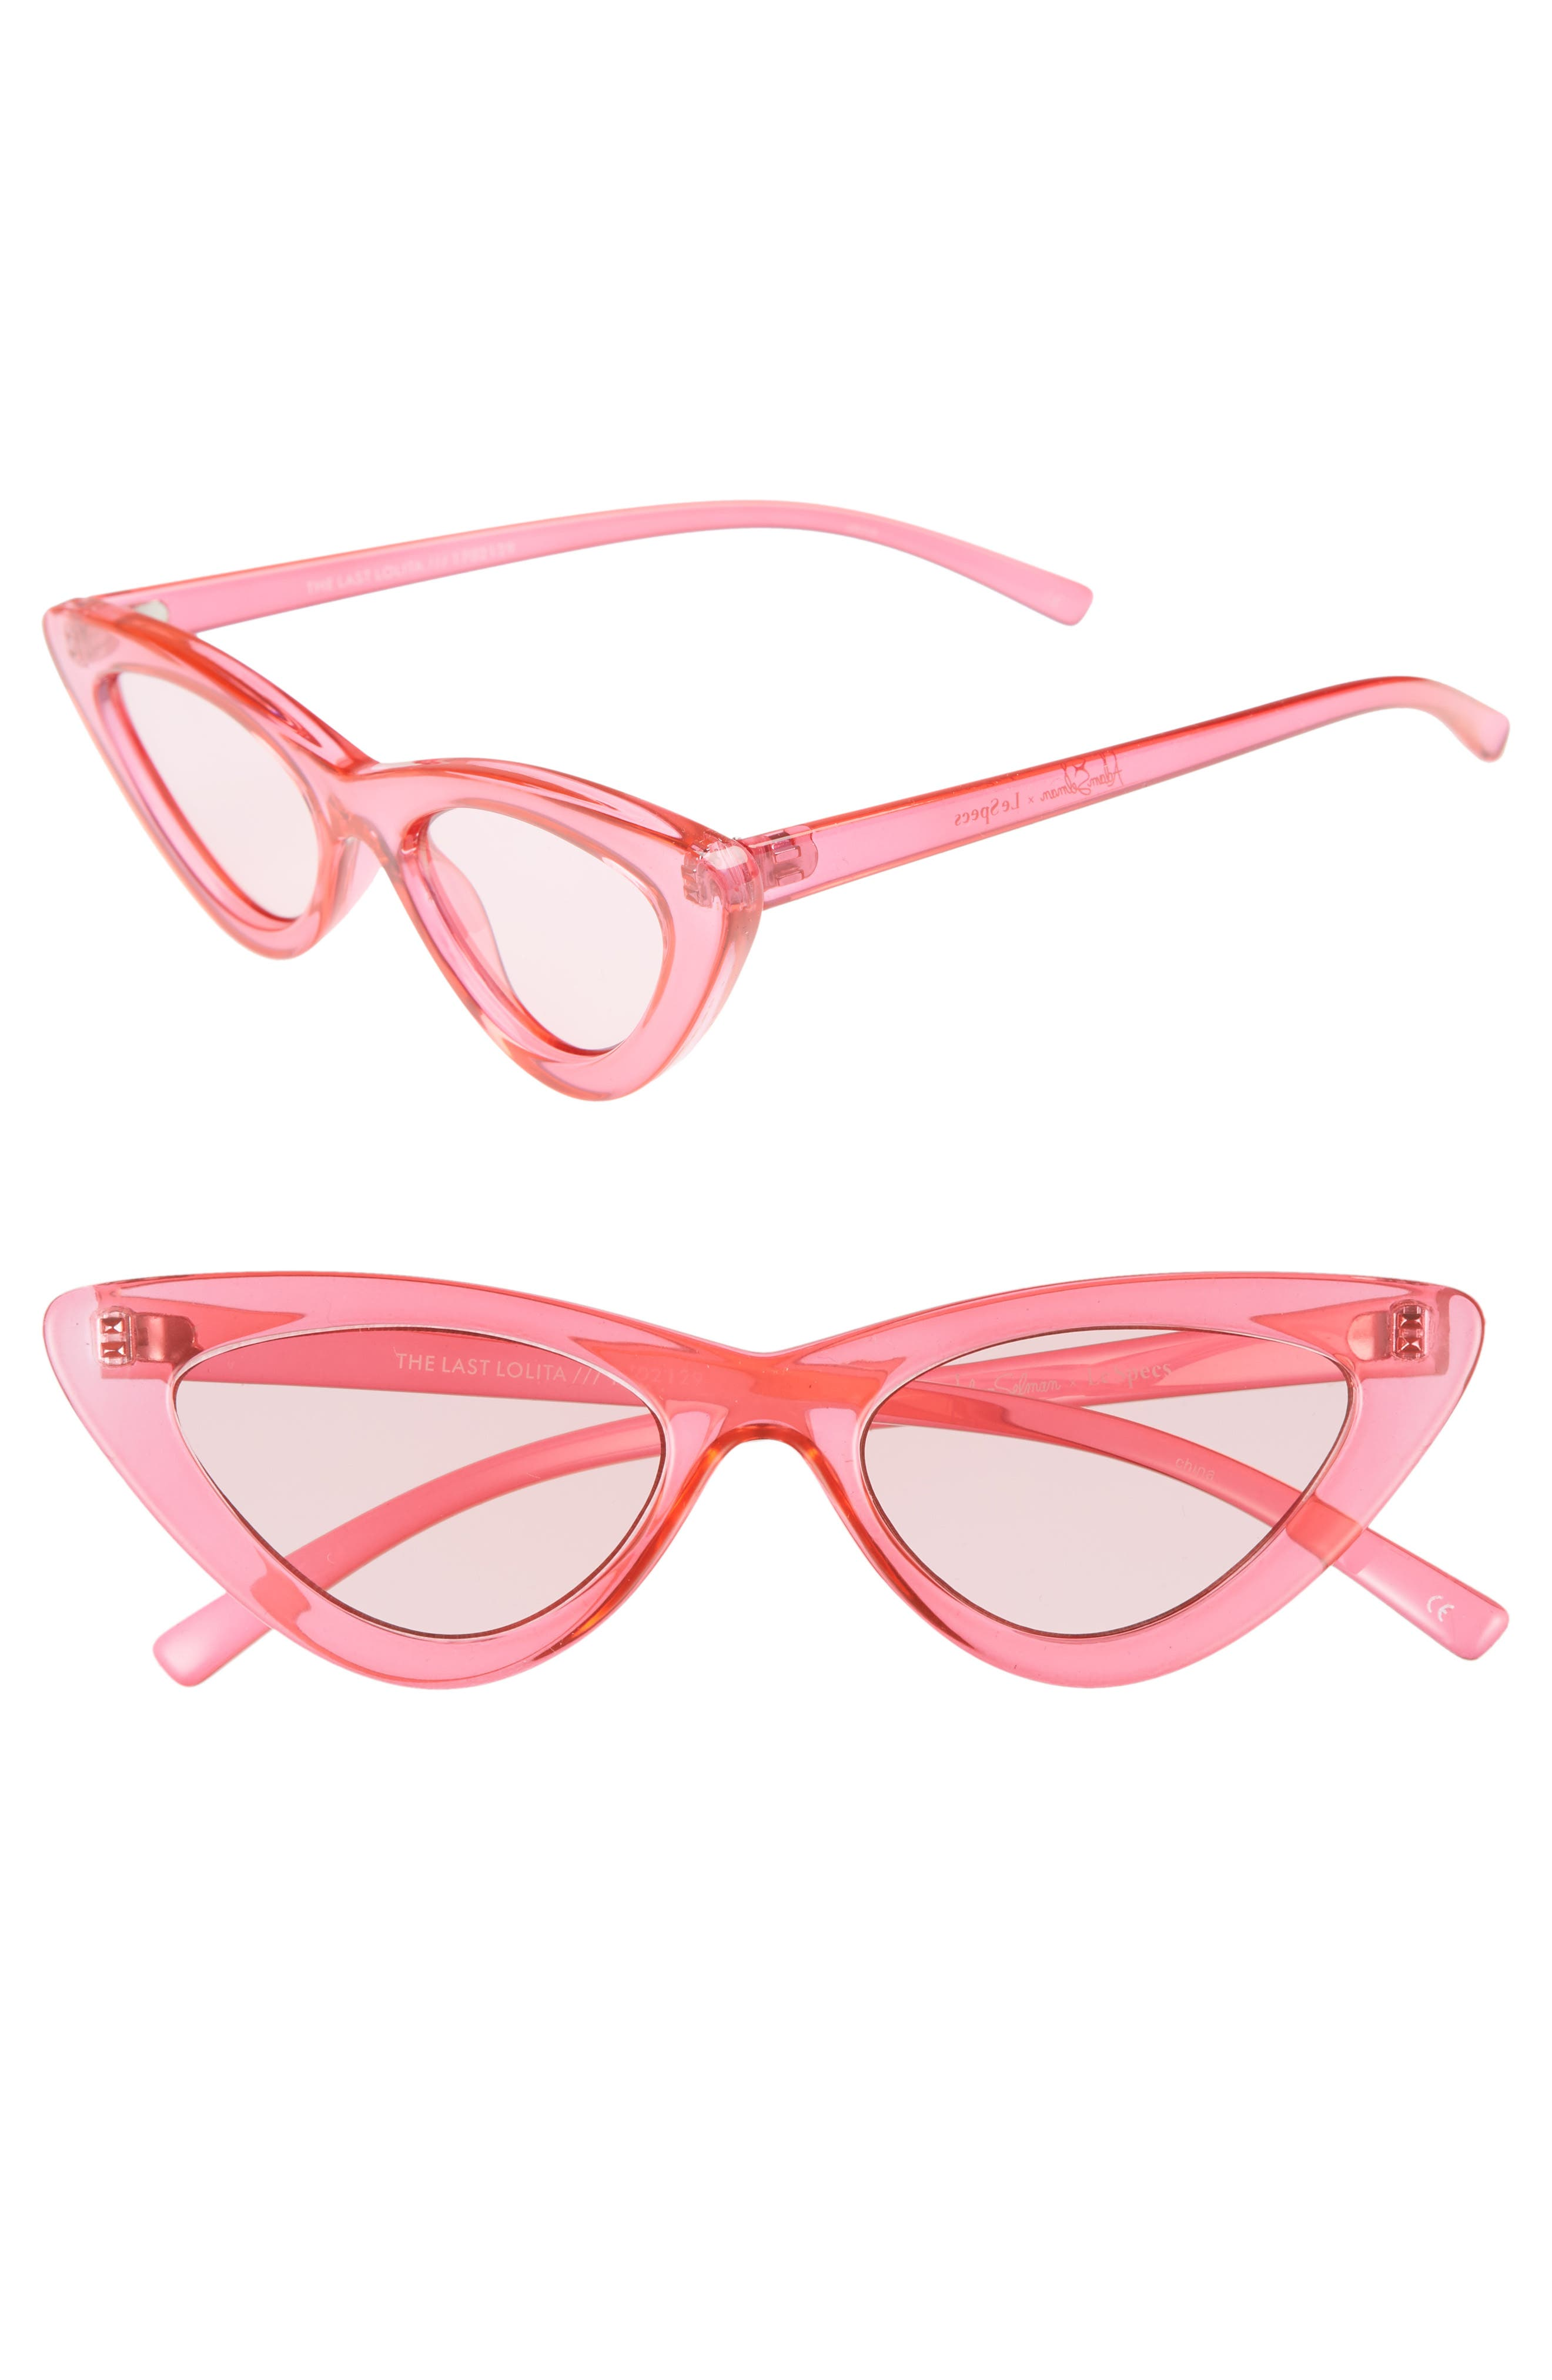 Adam Selman x Le Specs Luxe Last Lolita 49mm Cat Eye Sunglasses